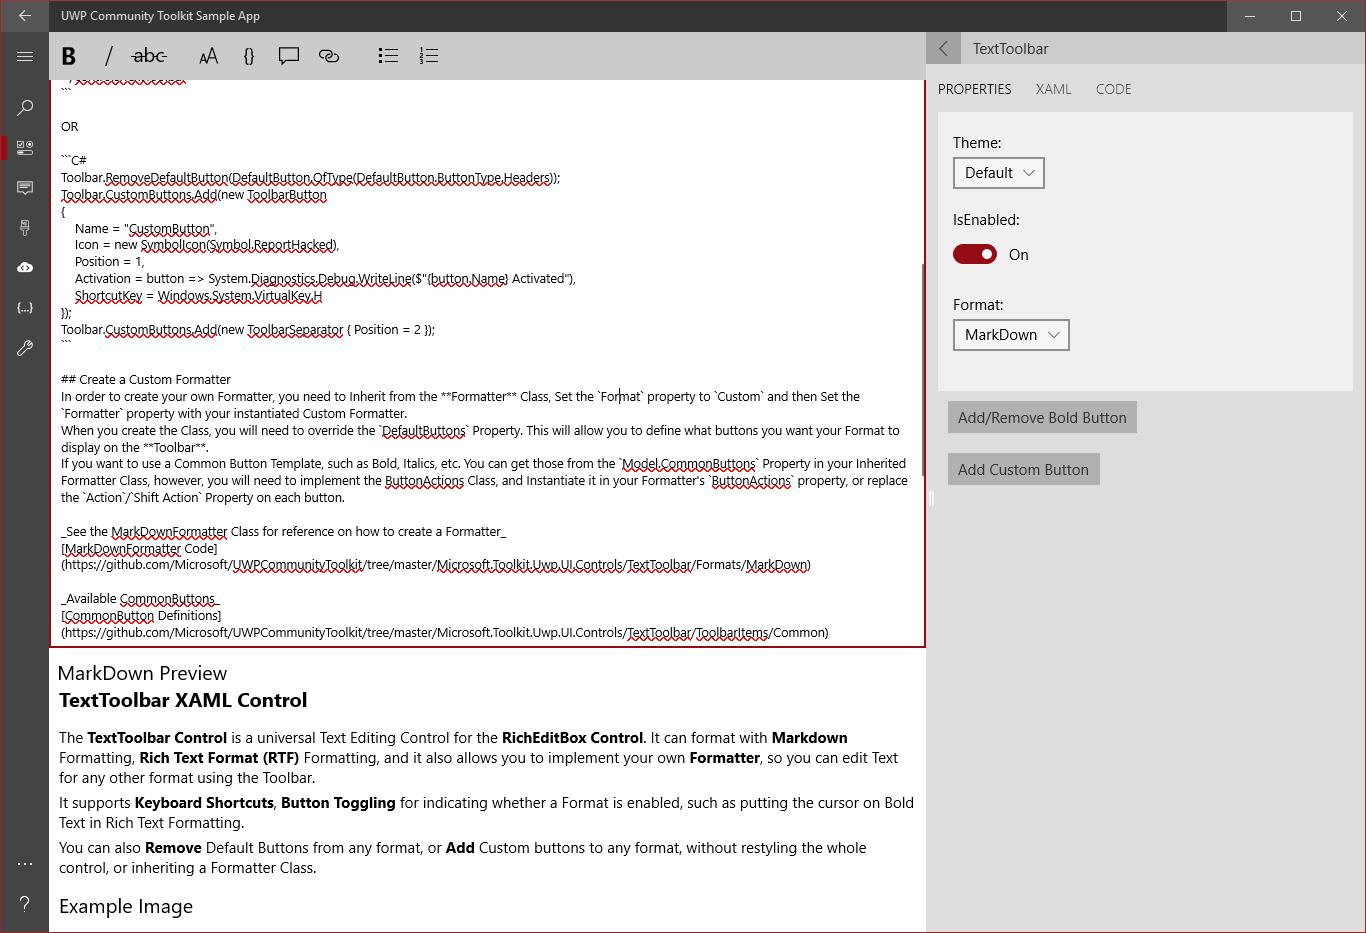 Datagrid Xaml Control Windows Community Toolkit Microsoft